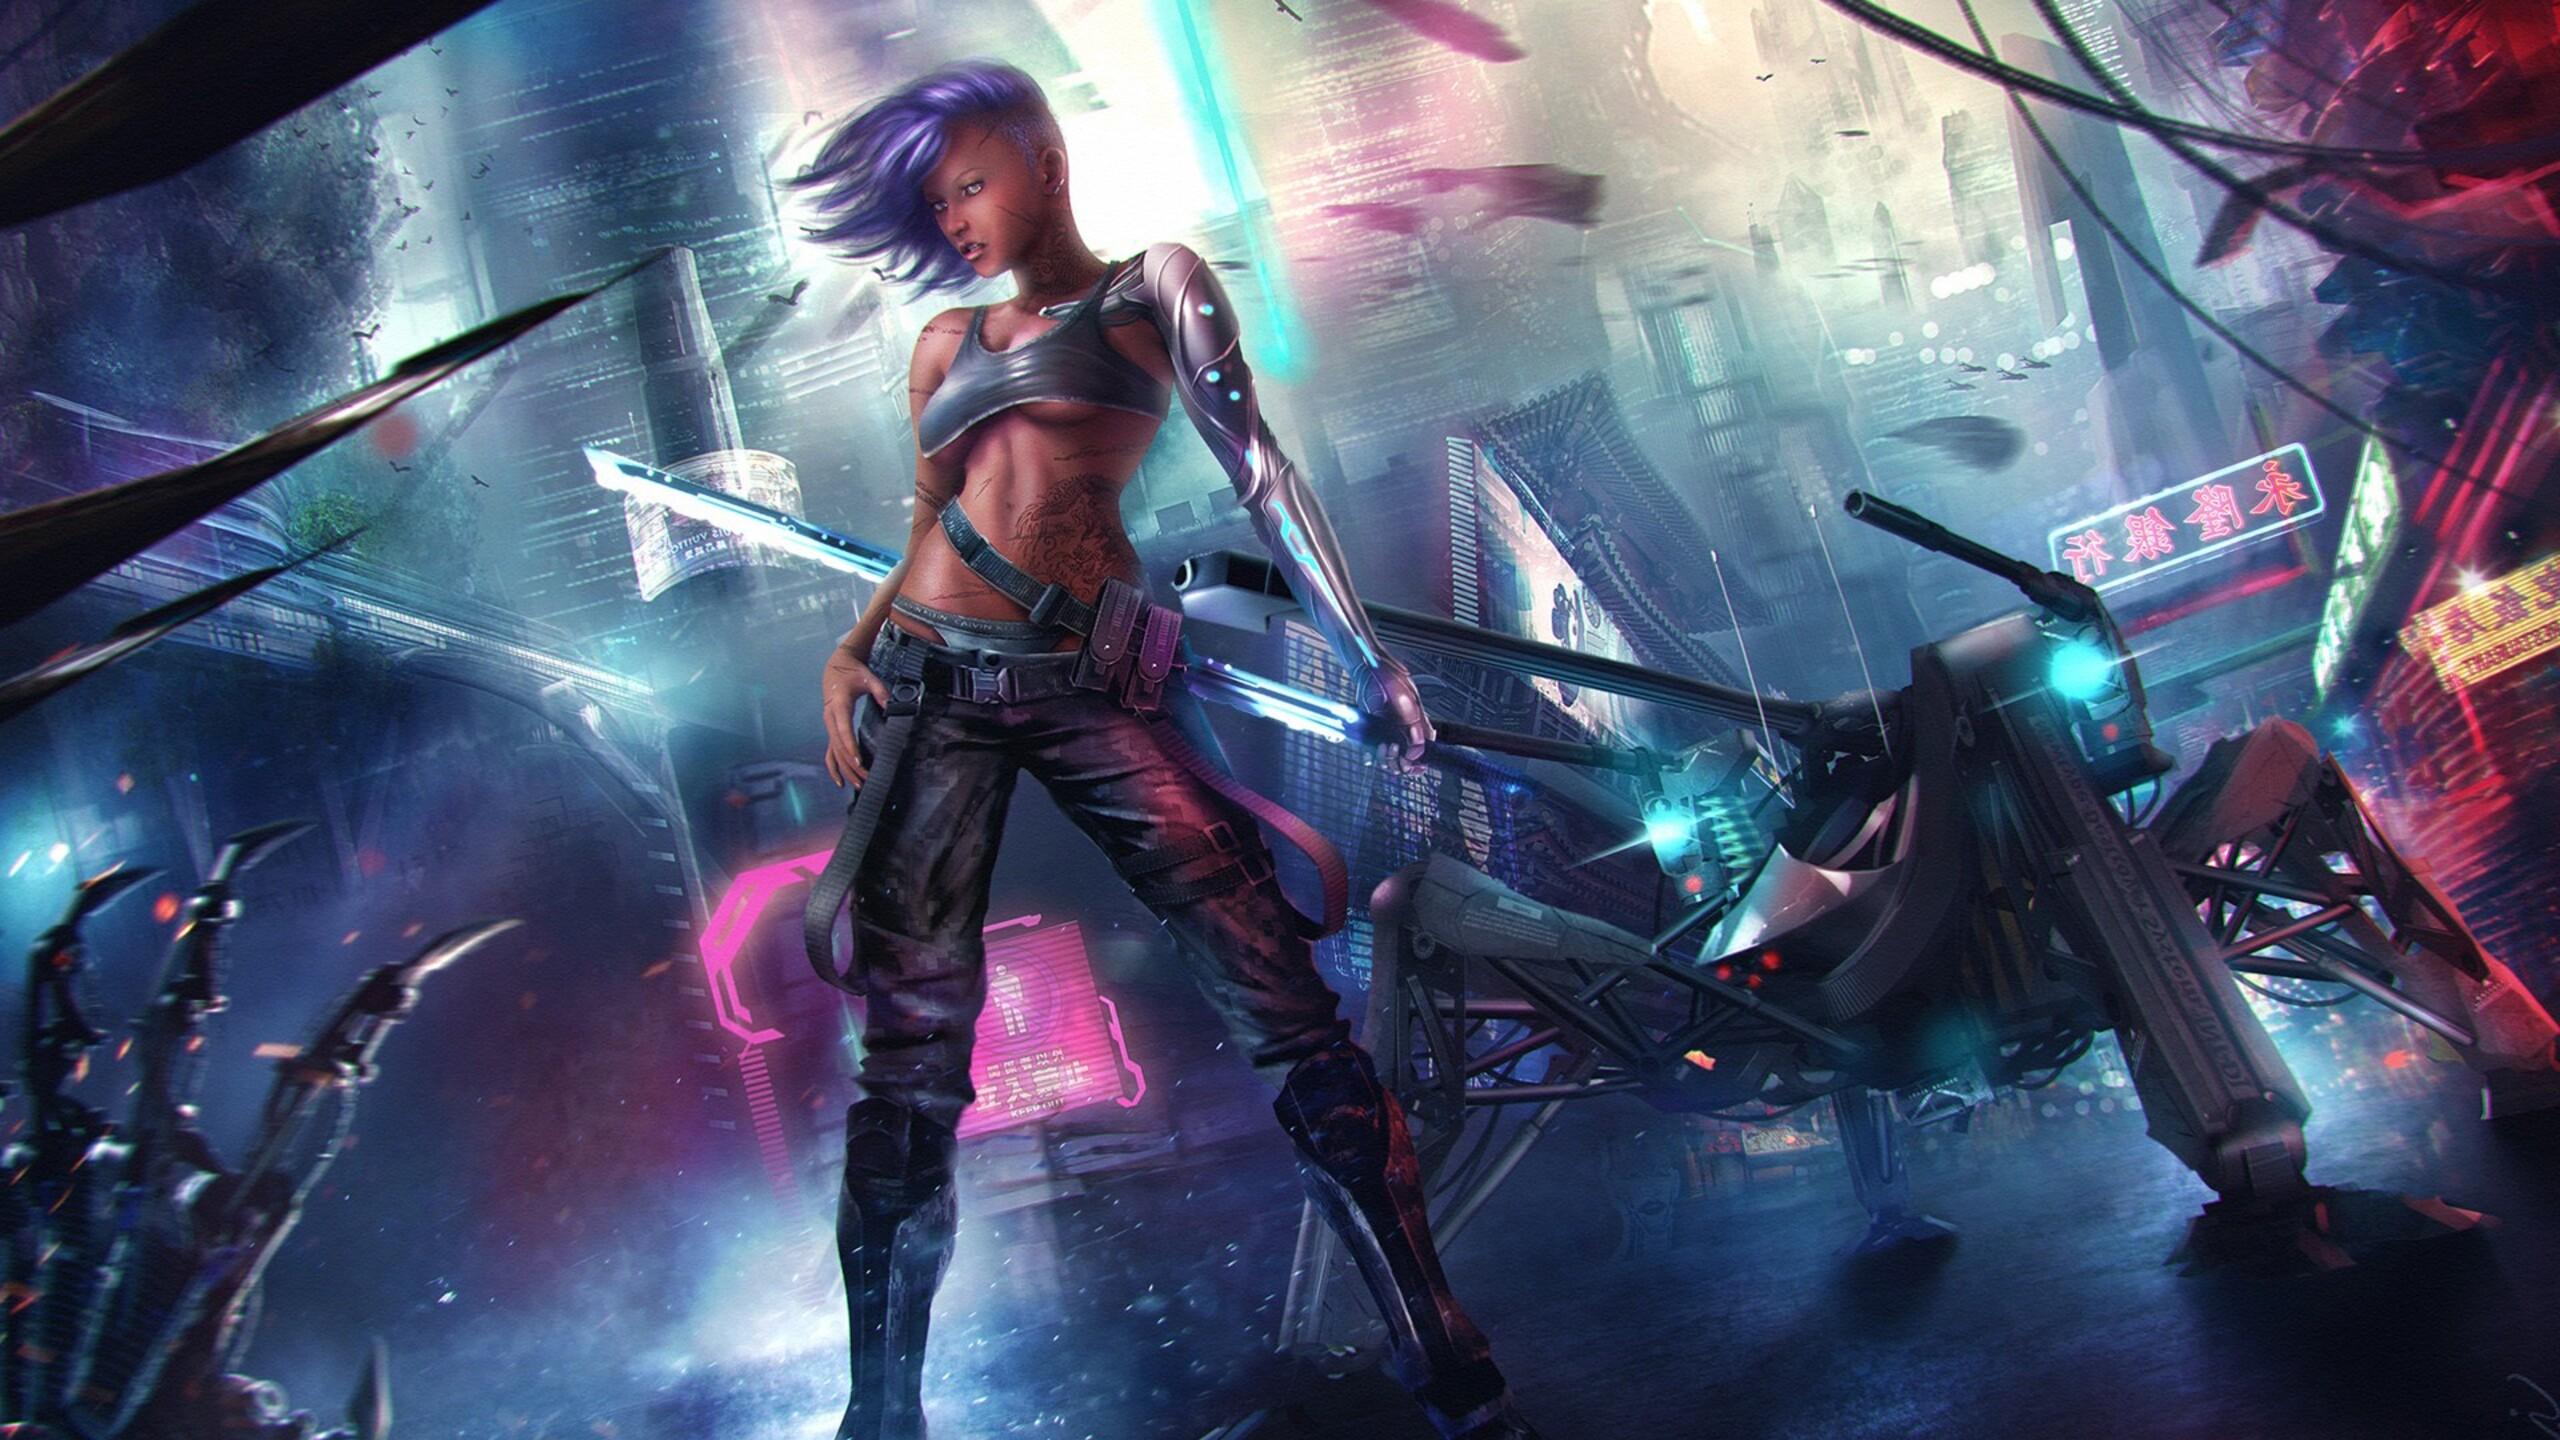 Gamer Girl Spaceship Wallpaper 2560x1440 Asian Cyberpunk 1440p Resolution Hd 4k